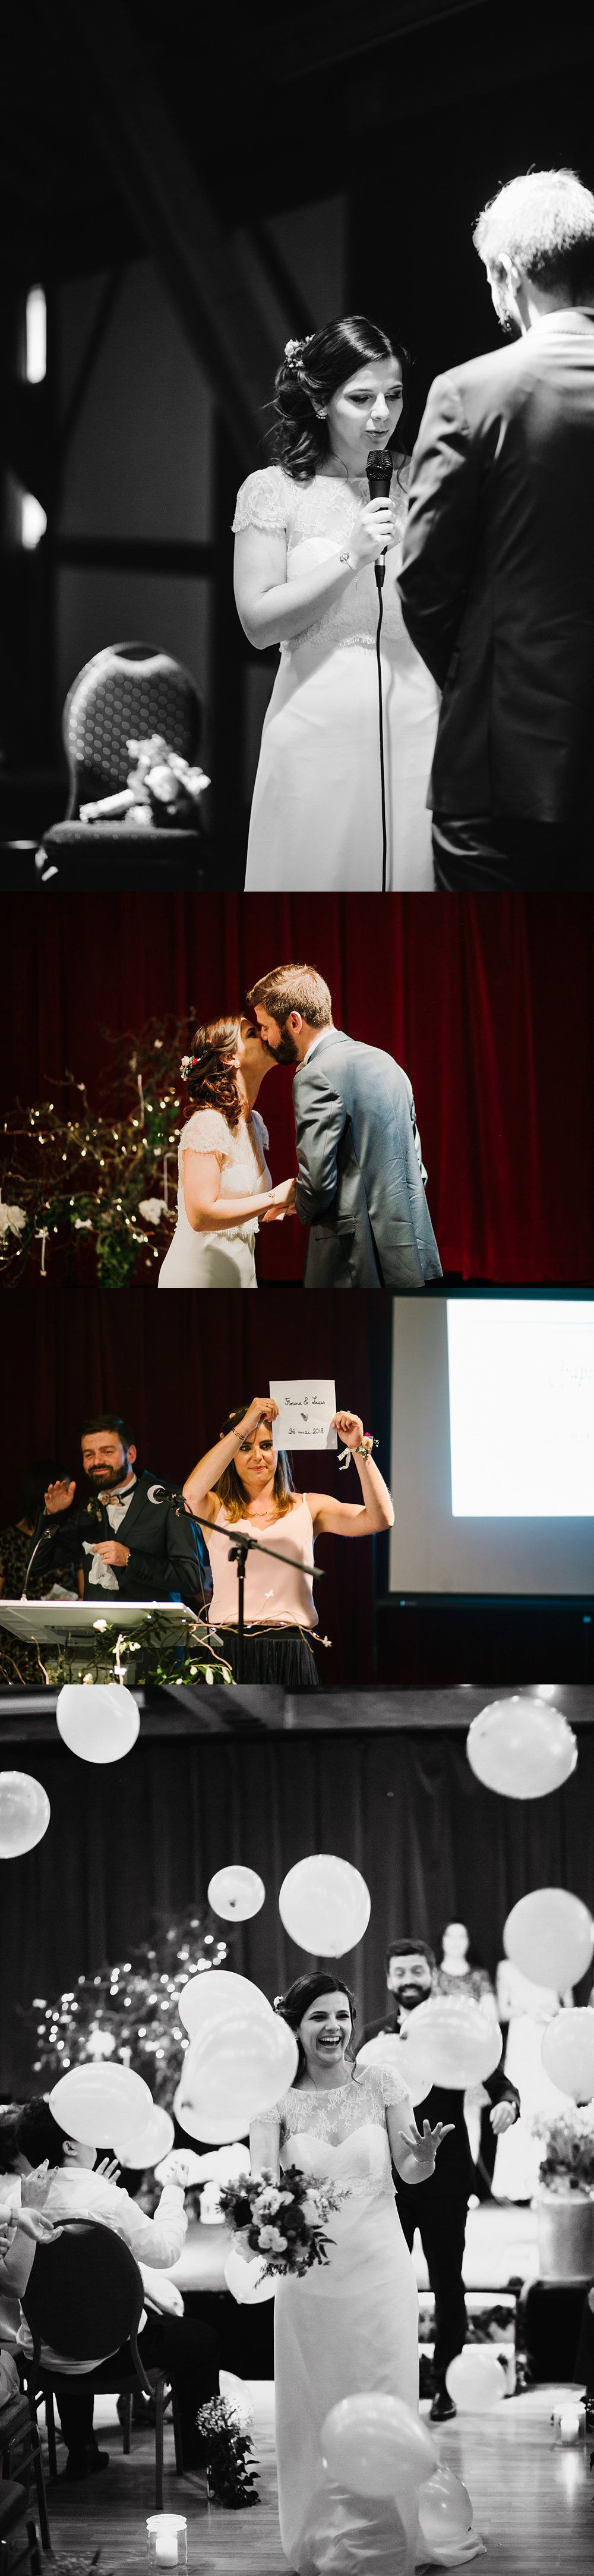 Photographe mariage Alsace Strasbourg guinguette